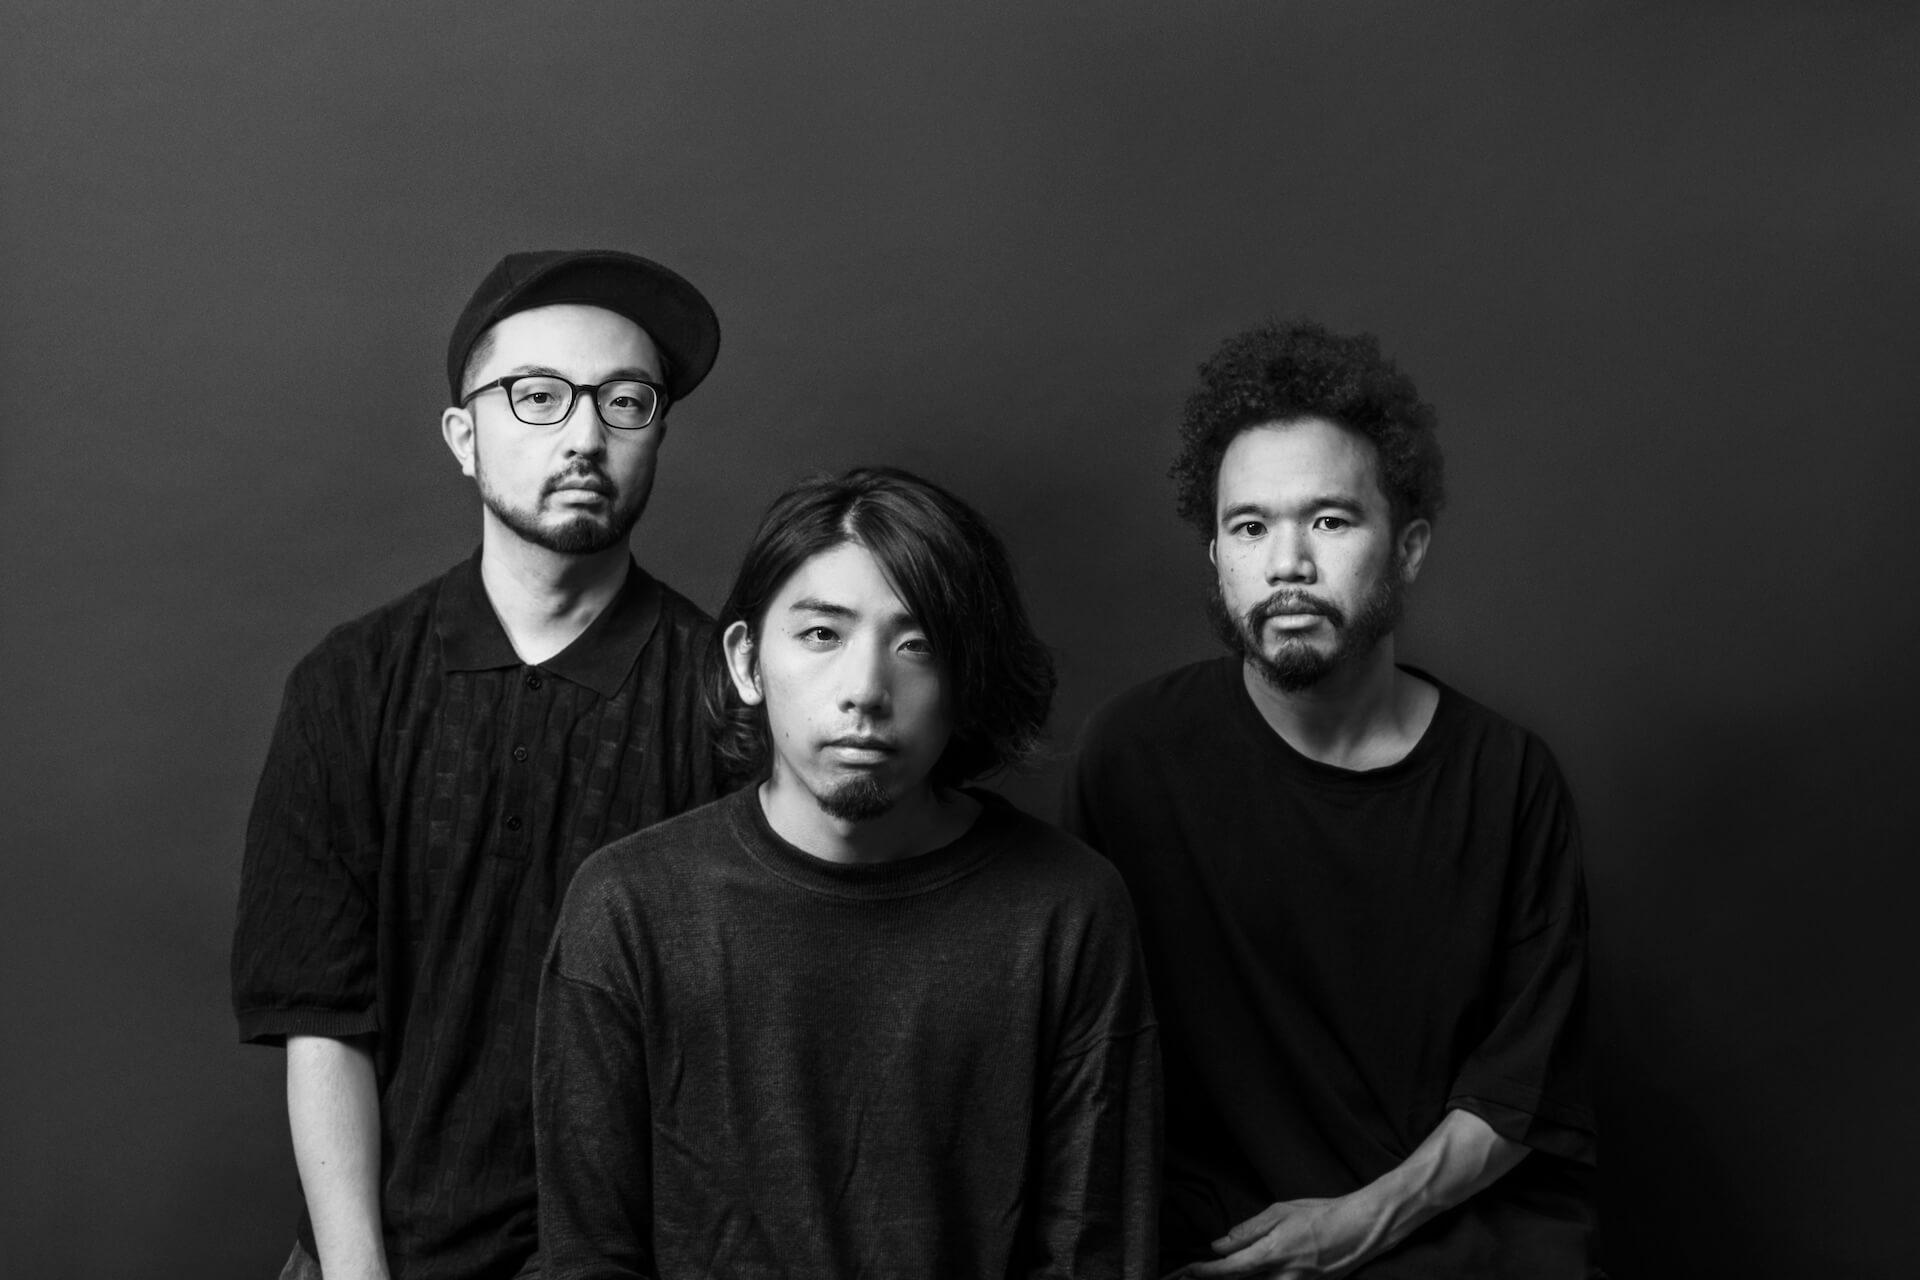 Ovall、最新のセルフタイトルアルバムをアナログ化|WONKのHIKARU ARATA、KENTO NAGATSUKAによる「Stargazer Rework」収録 music200117_ovall_lp_2